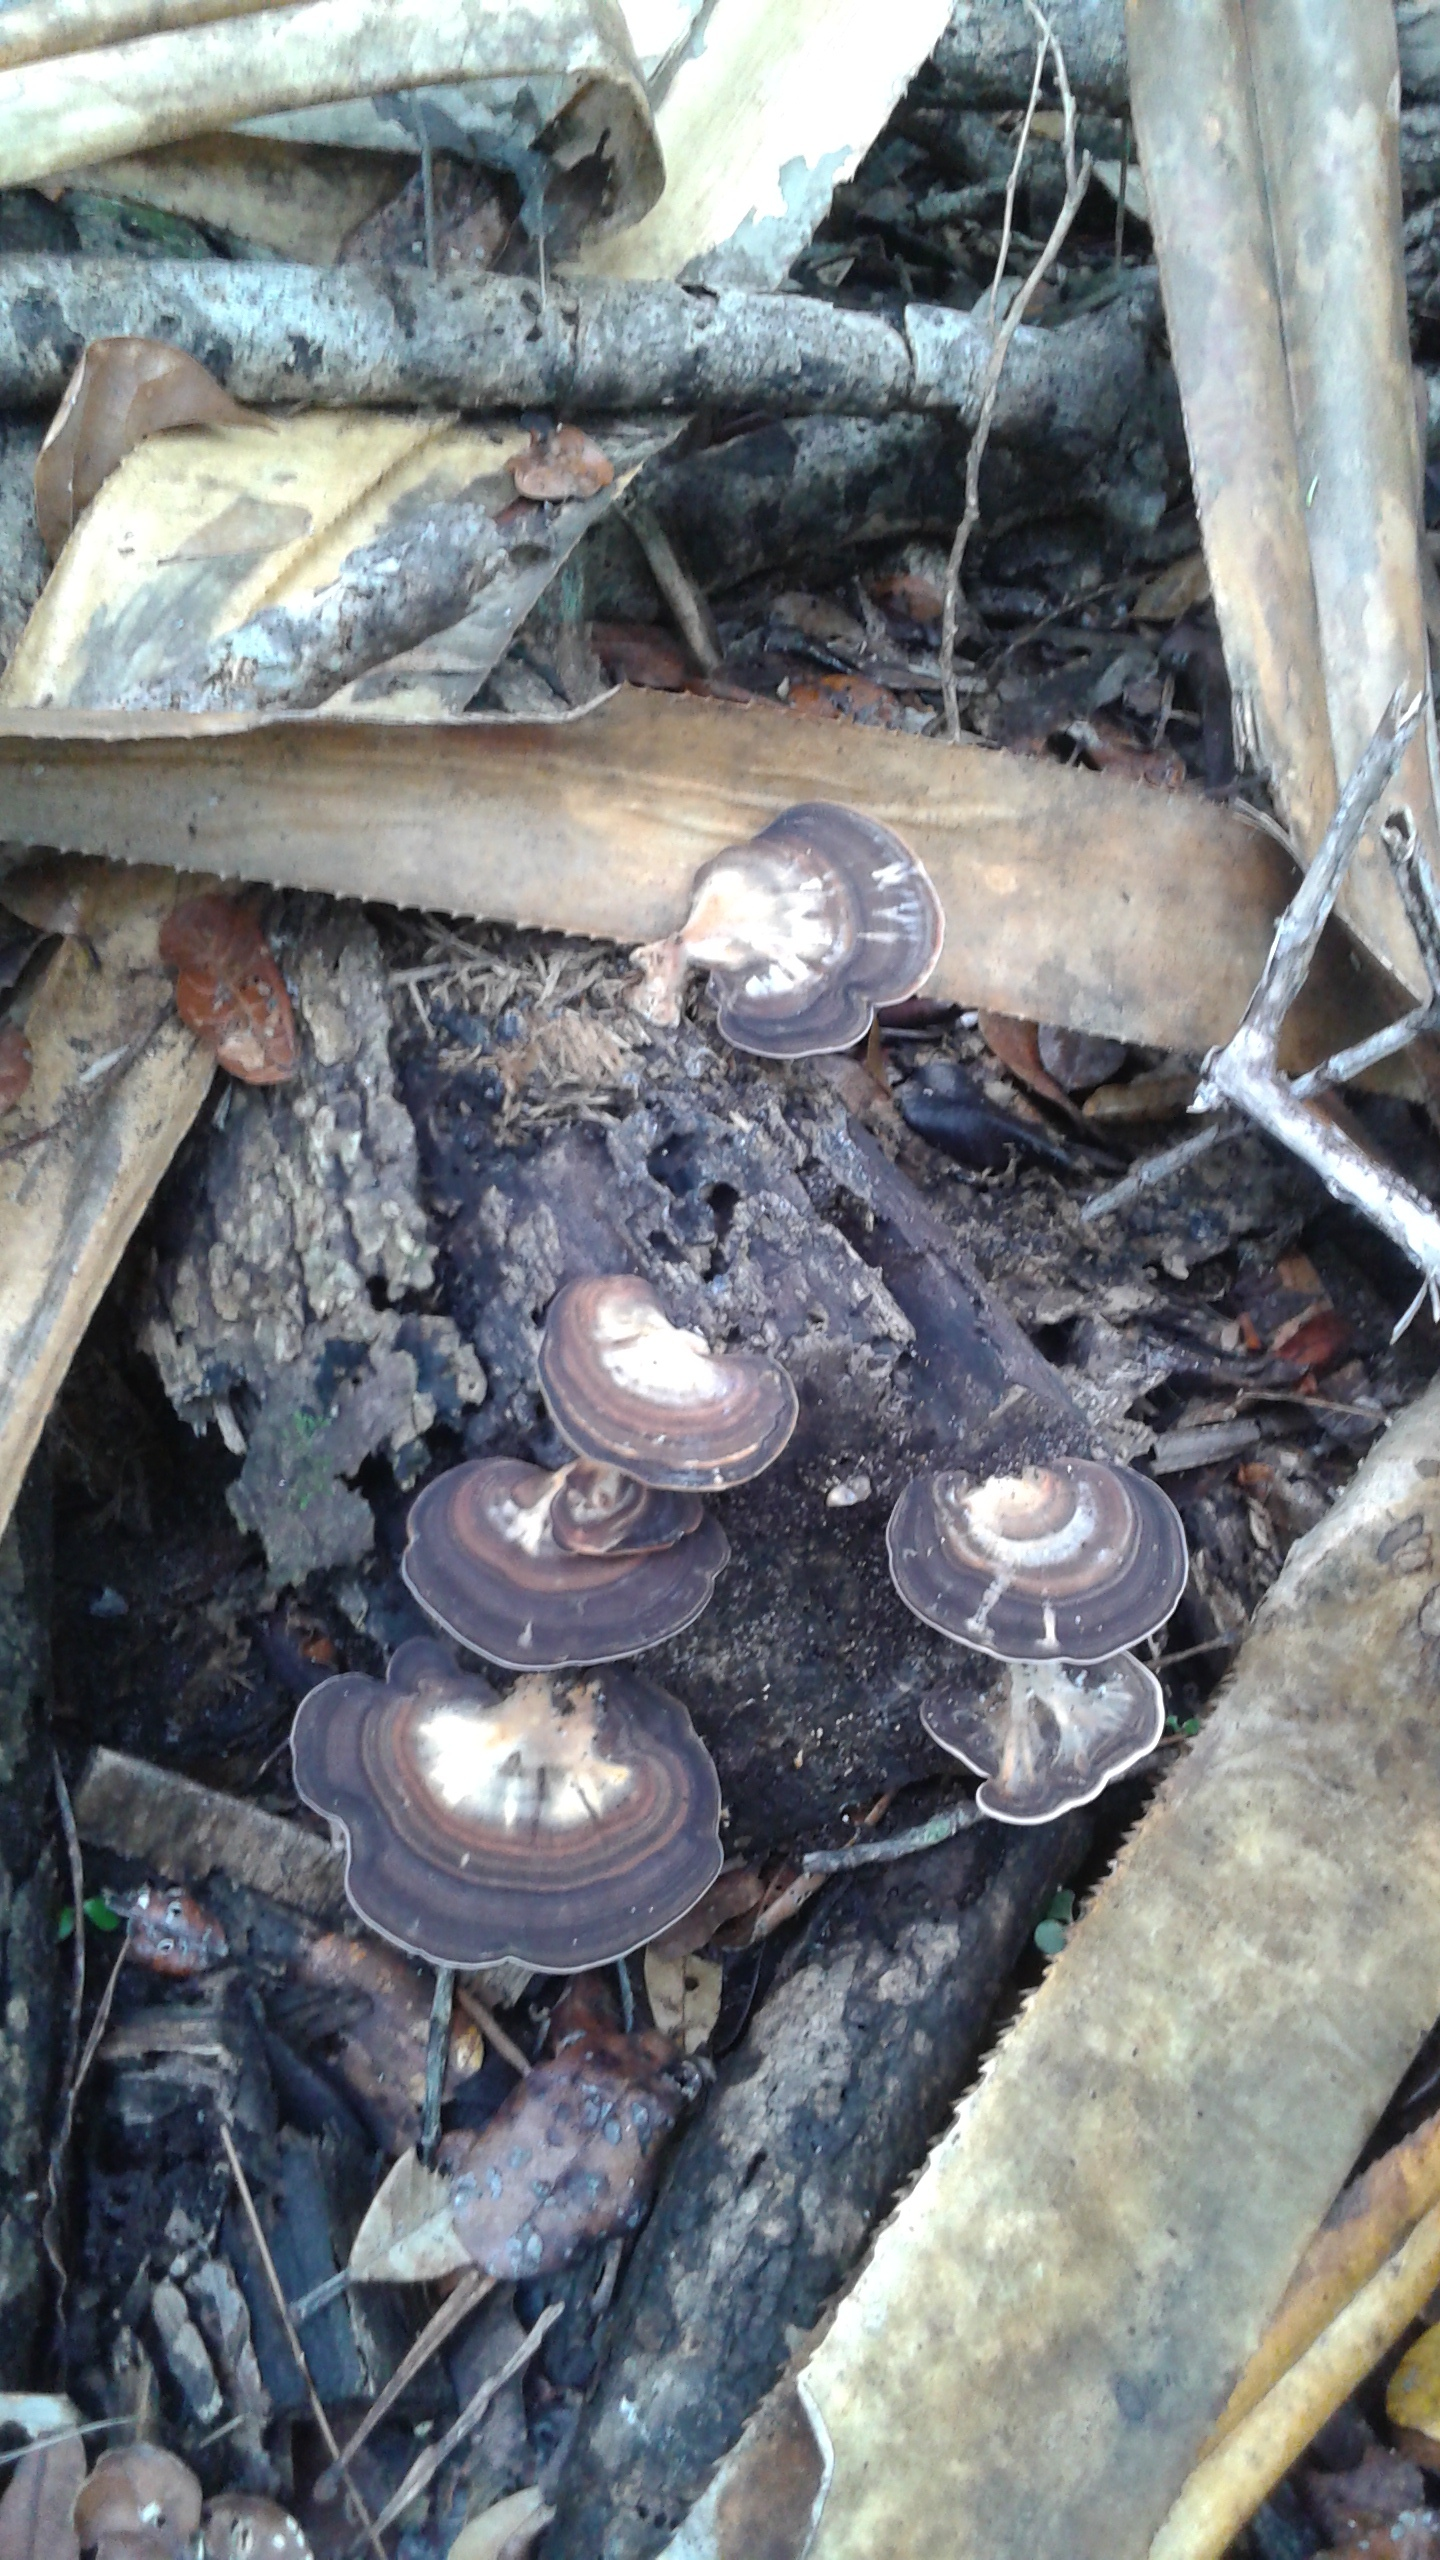 Shelf mushrooms